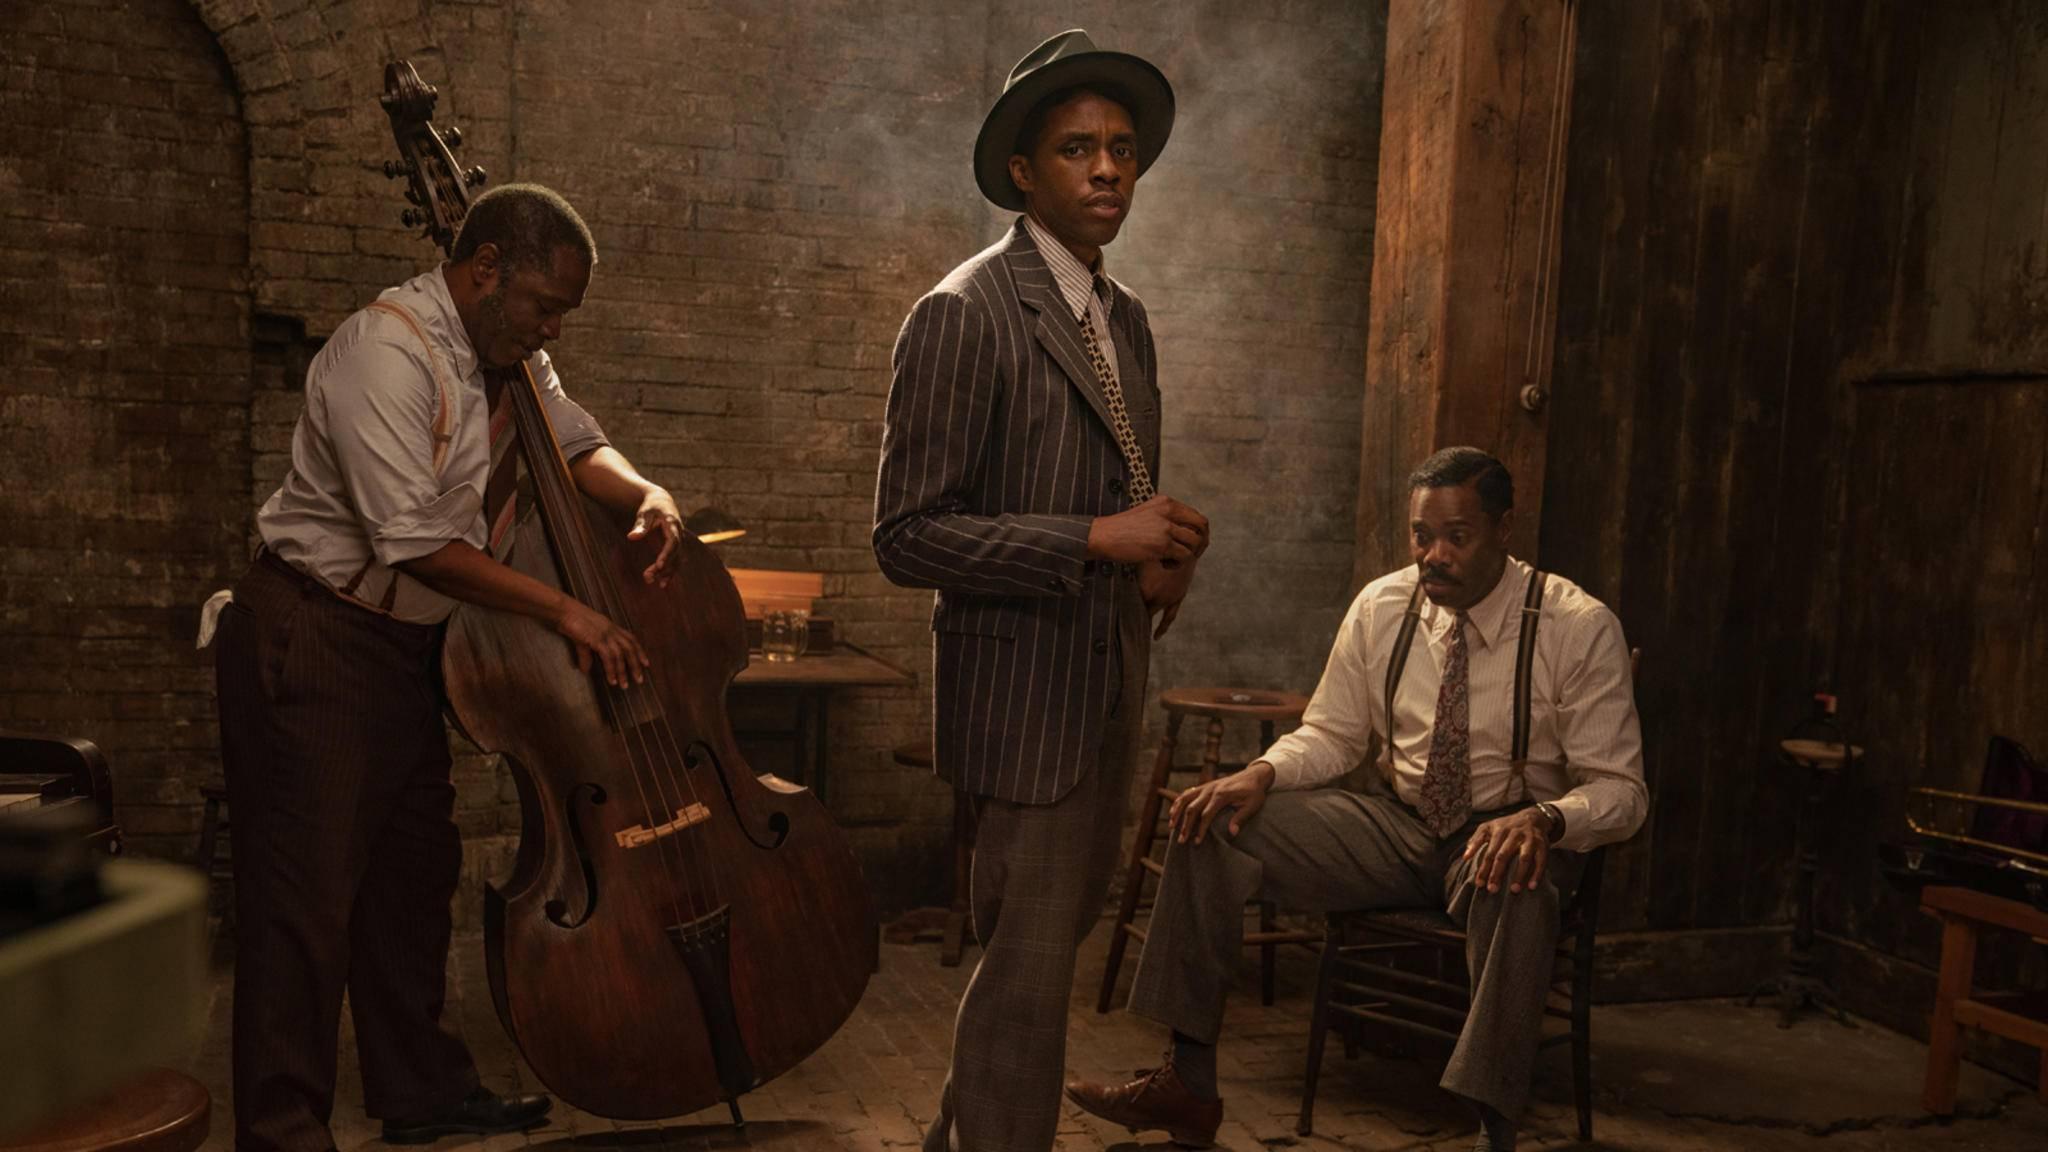 Ma Rainey's Black Bottom Michael Potts, Chadwick Boseman und Colman Domingo